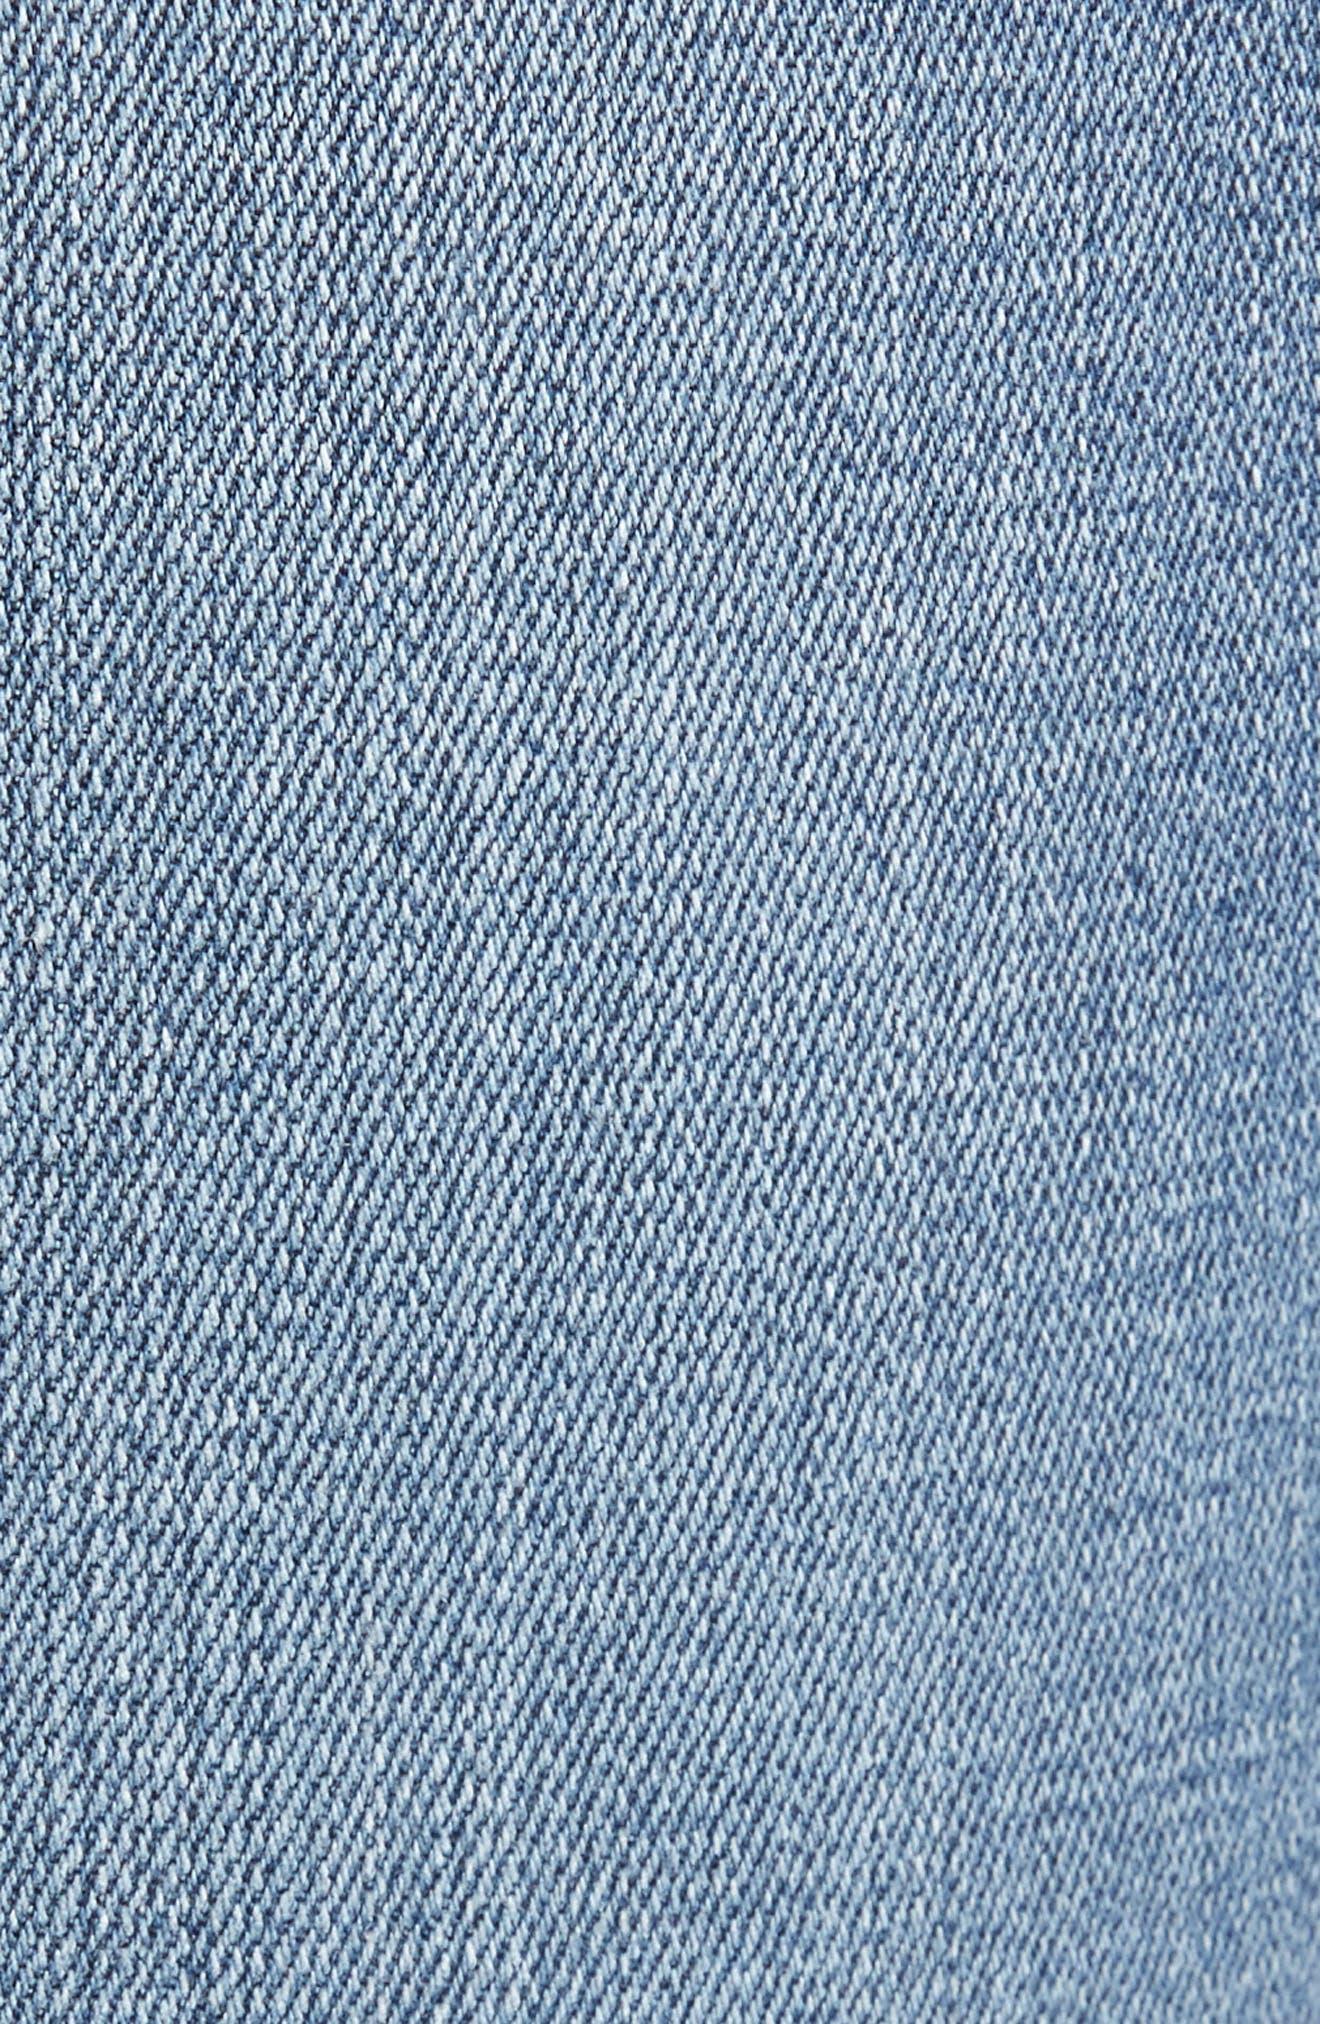 Alternate Image 5  - Good American Raw Hem High Waist Skinny Jeans (Blue 078) (Extended Sizes)